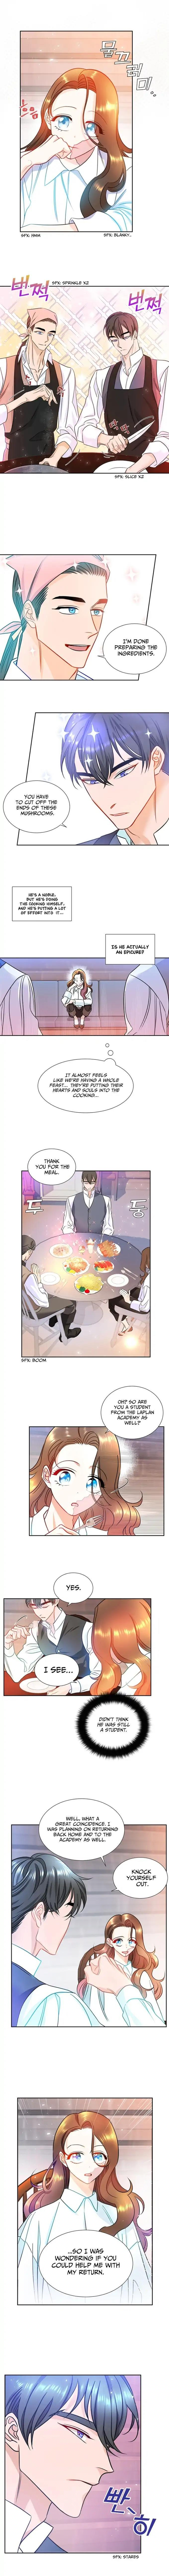 Manga The Princess' Spaceship - Chapter 7 Page 1